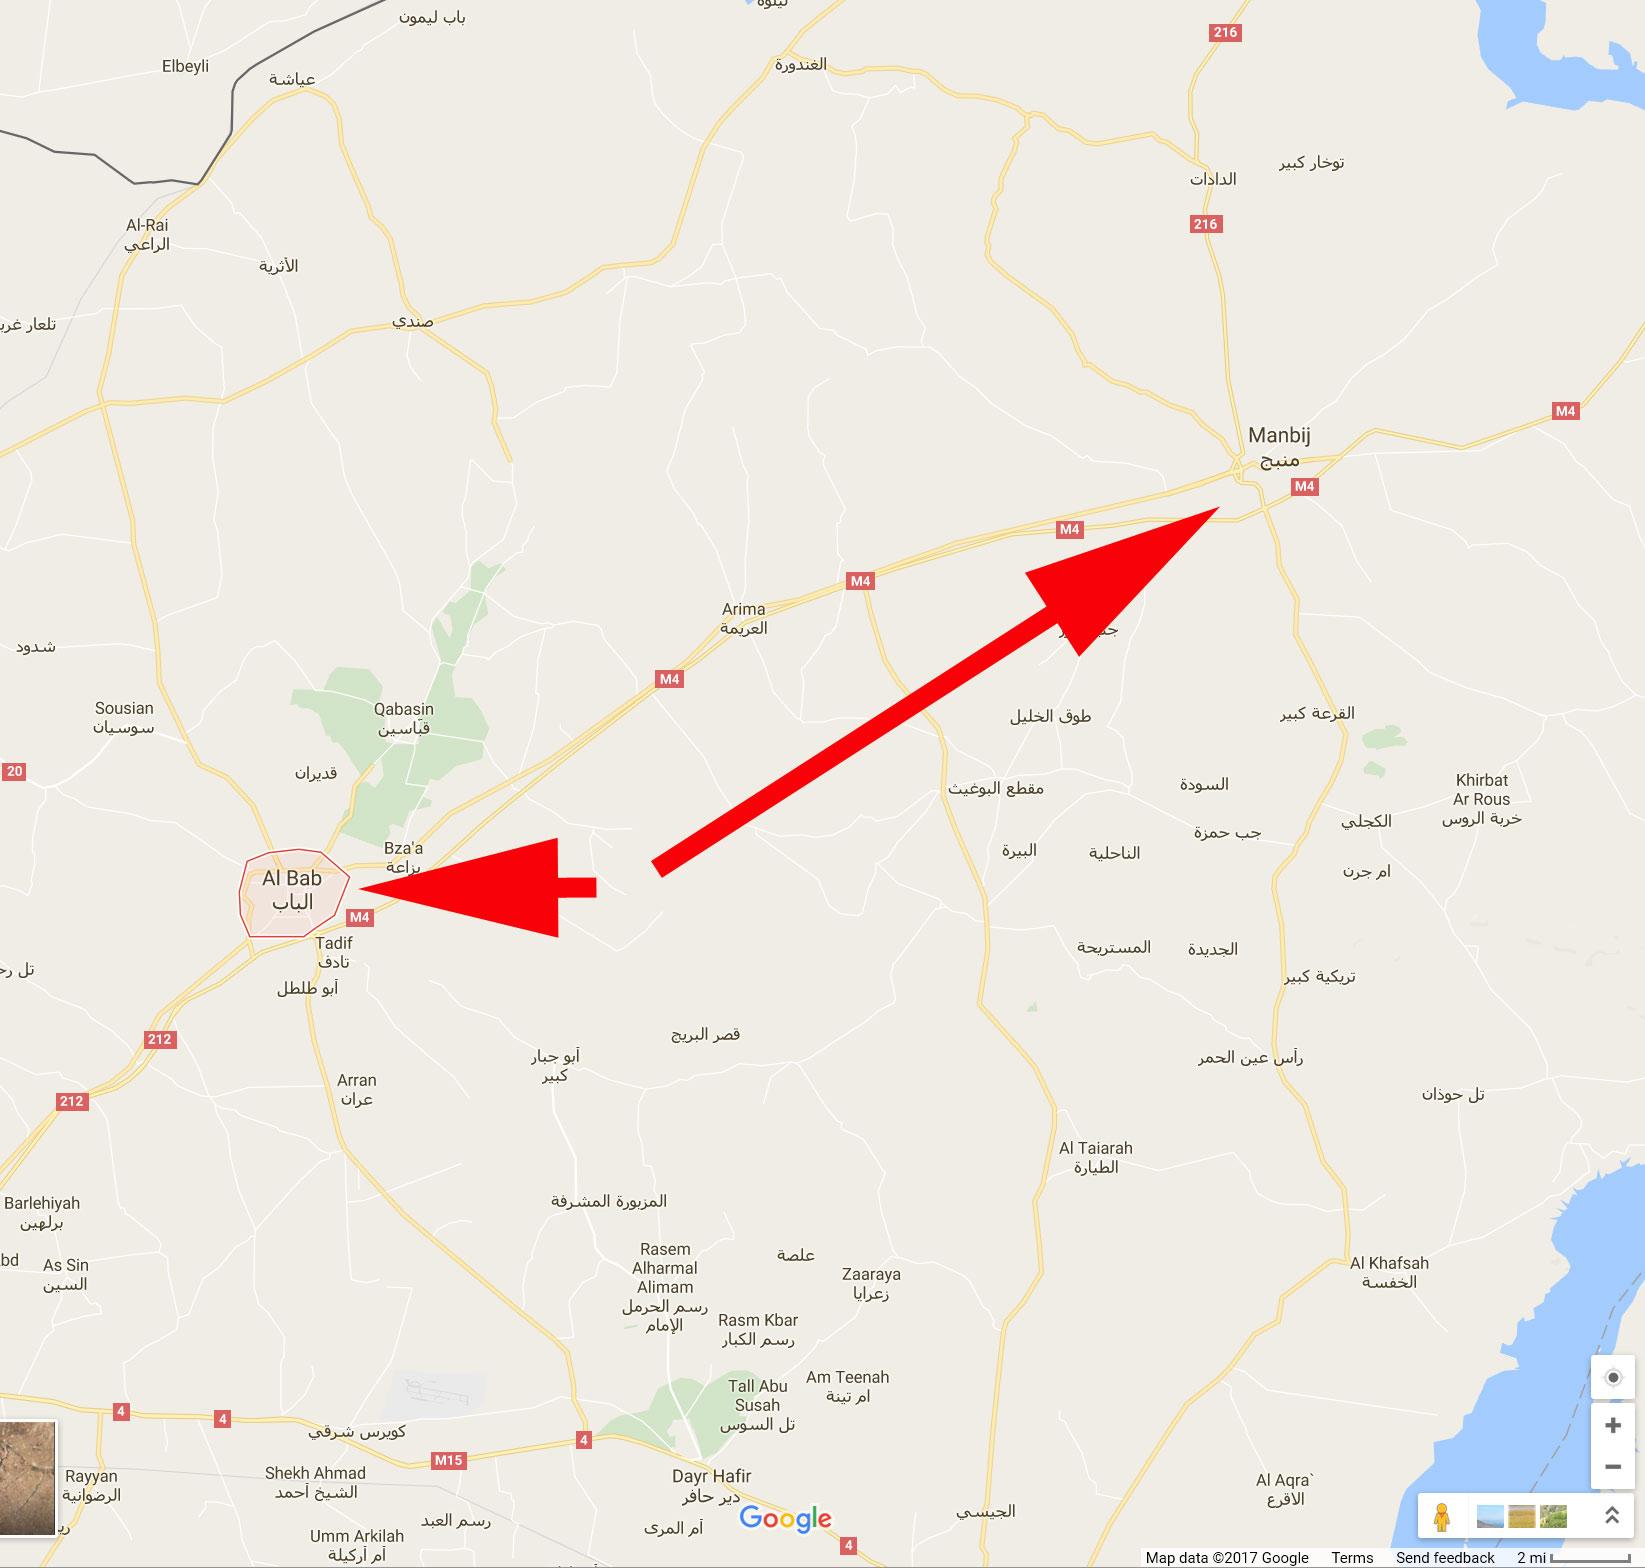 Al Bab and Manbij